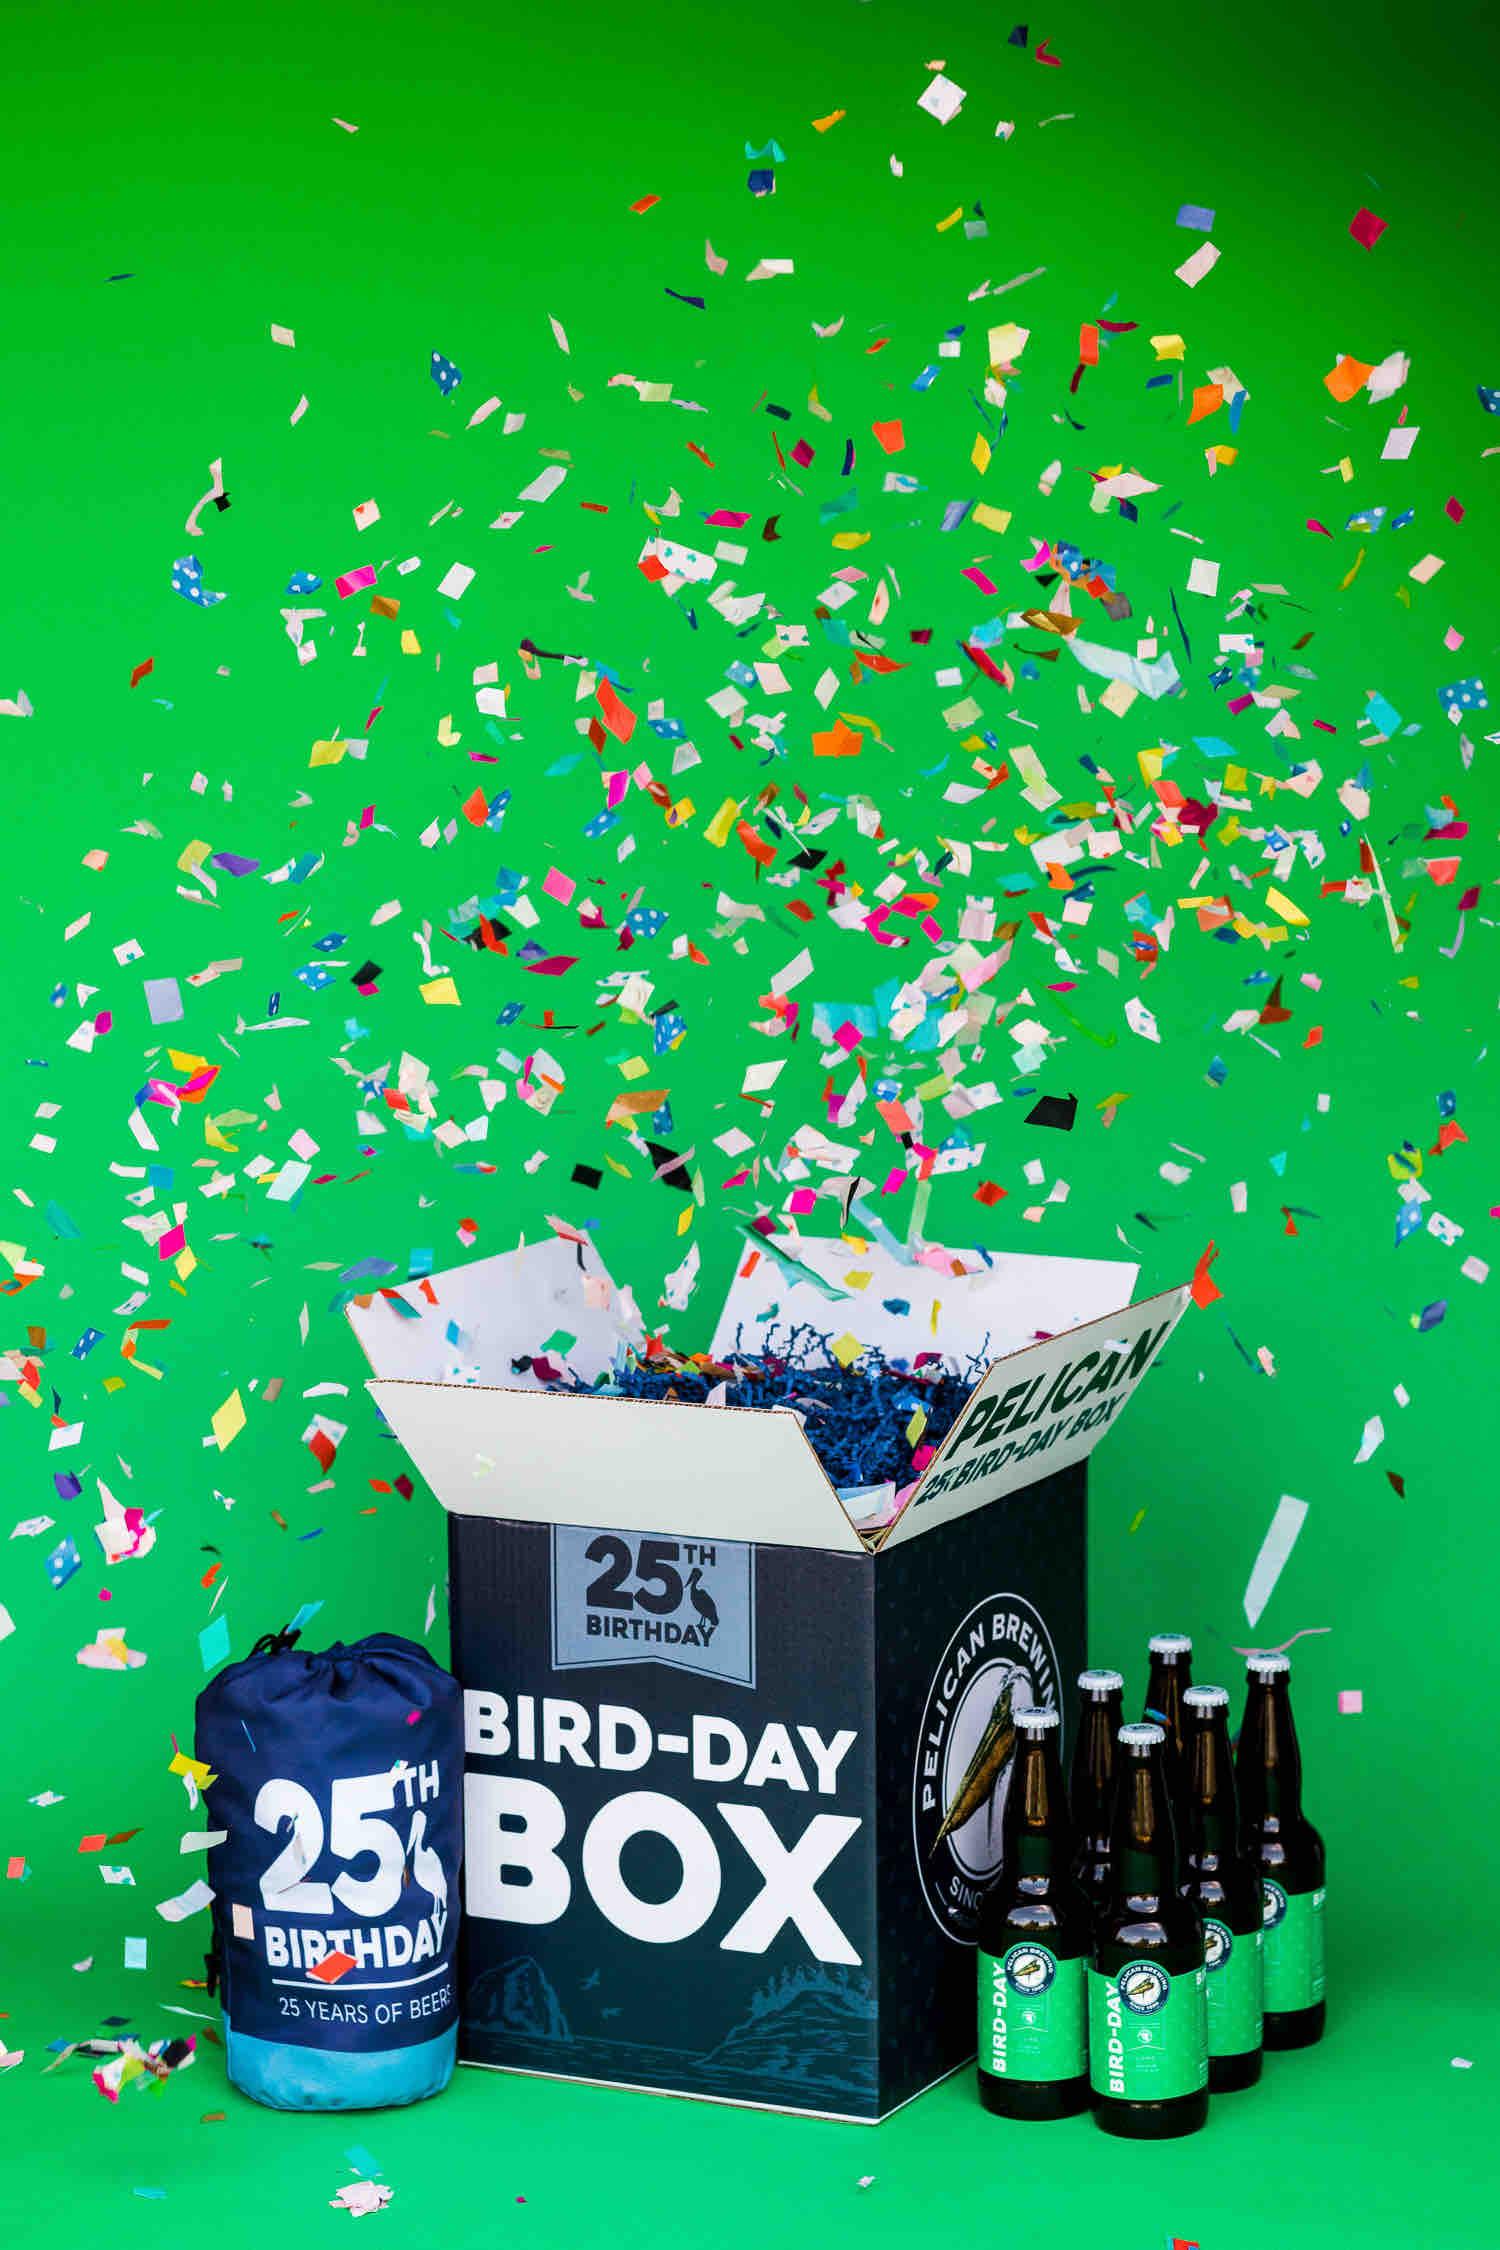 image of Bird-Day Box Volume III courtesy of Pelican Brewing Company